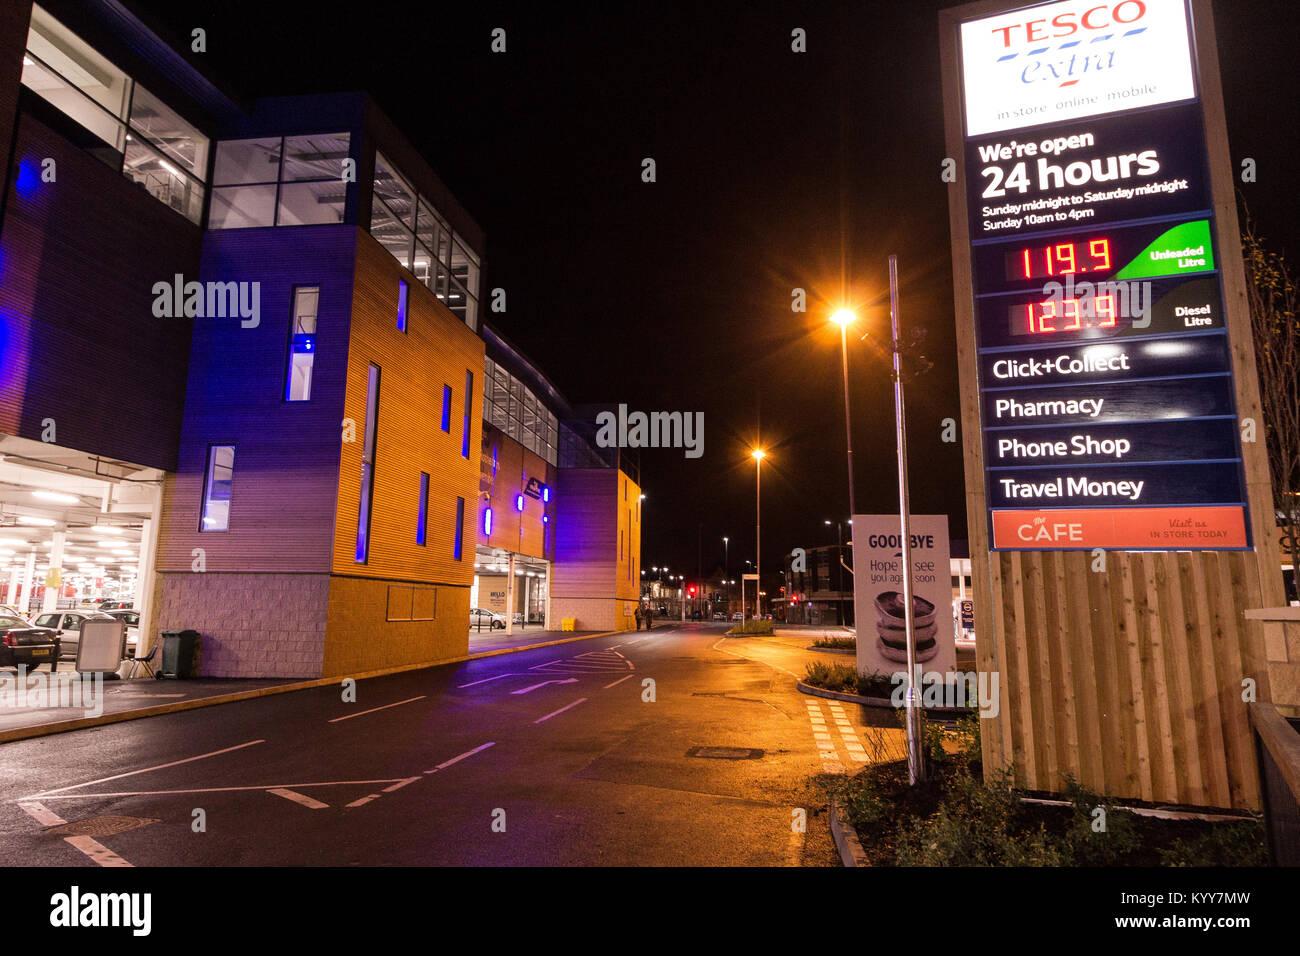 Petrol station uk night stock photos petrol station uk night stock images alamy - Esso garage opening times ...